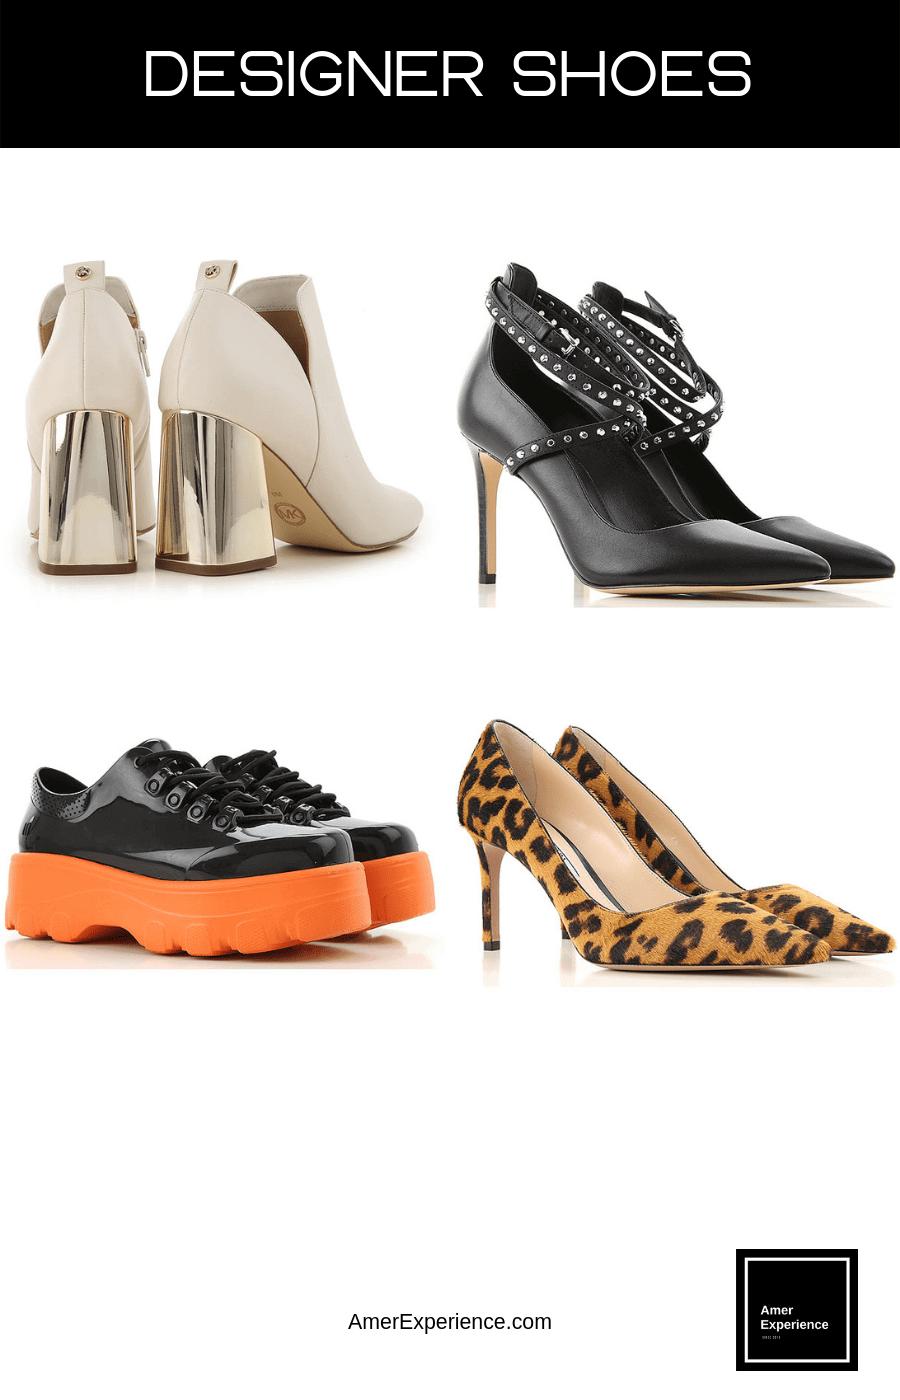 TOP FASHION ONLINE STORES - SHOES   Best Global Online Stores  To Buy Shoes, Sandals and Designer Footwear  Elegantes Zapatos de Designer Moda A Buenos Precios